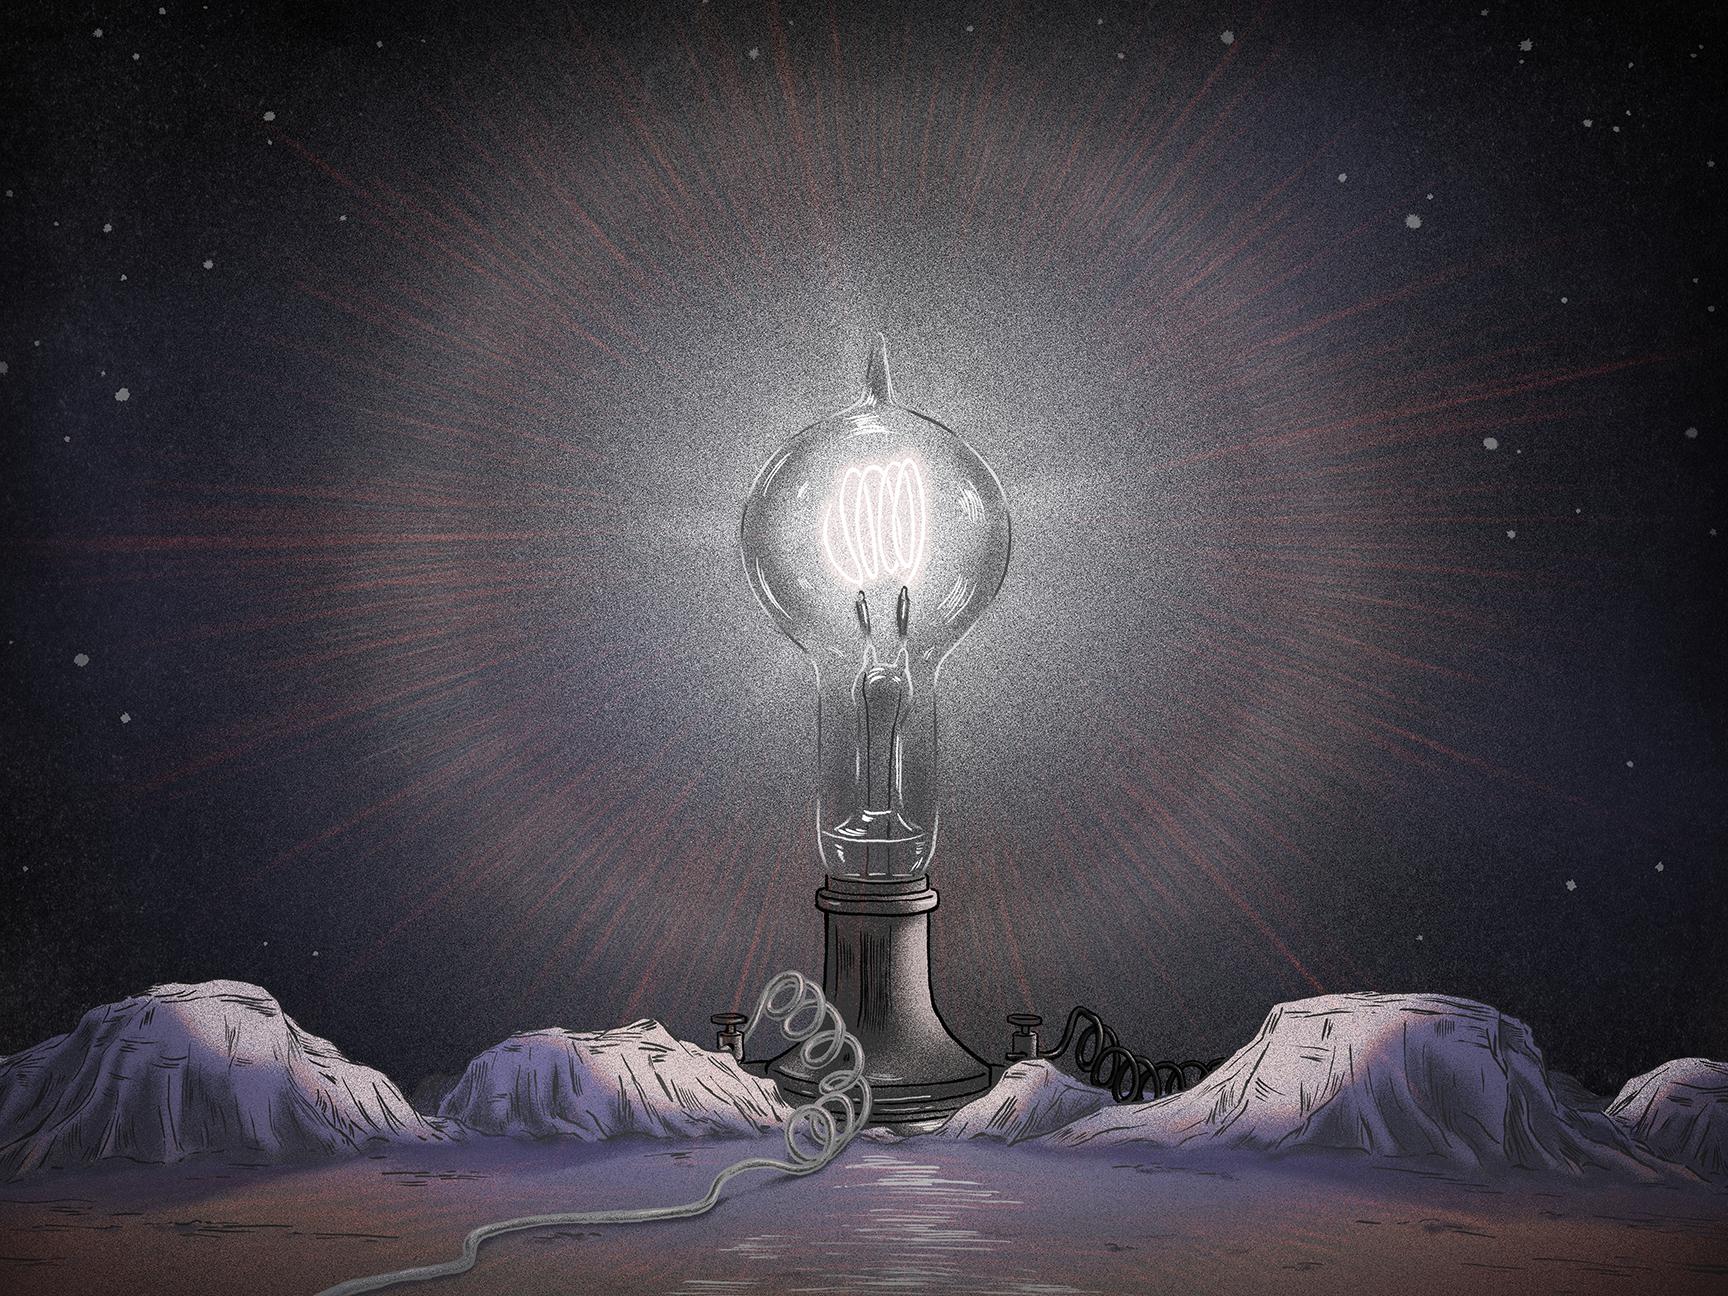 2019_Insomnia Book_lightbulb.jpg